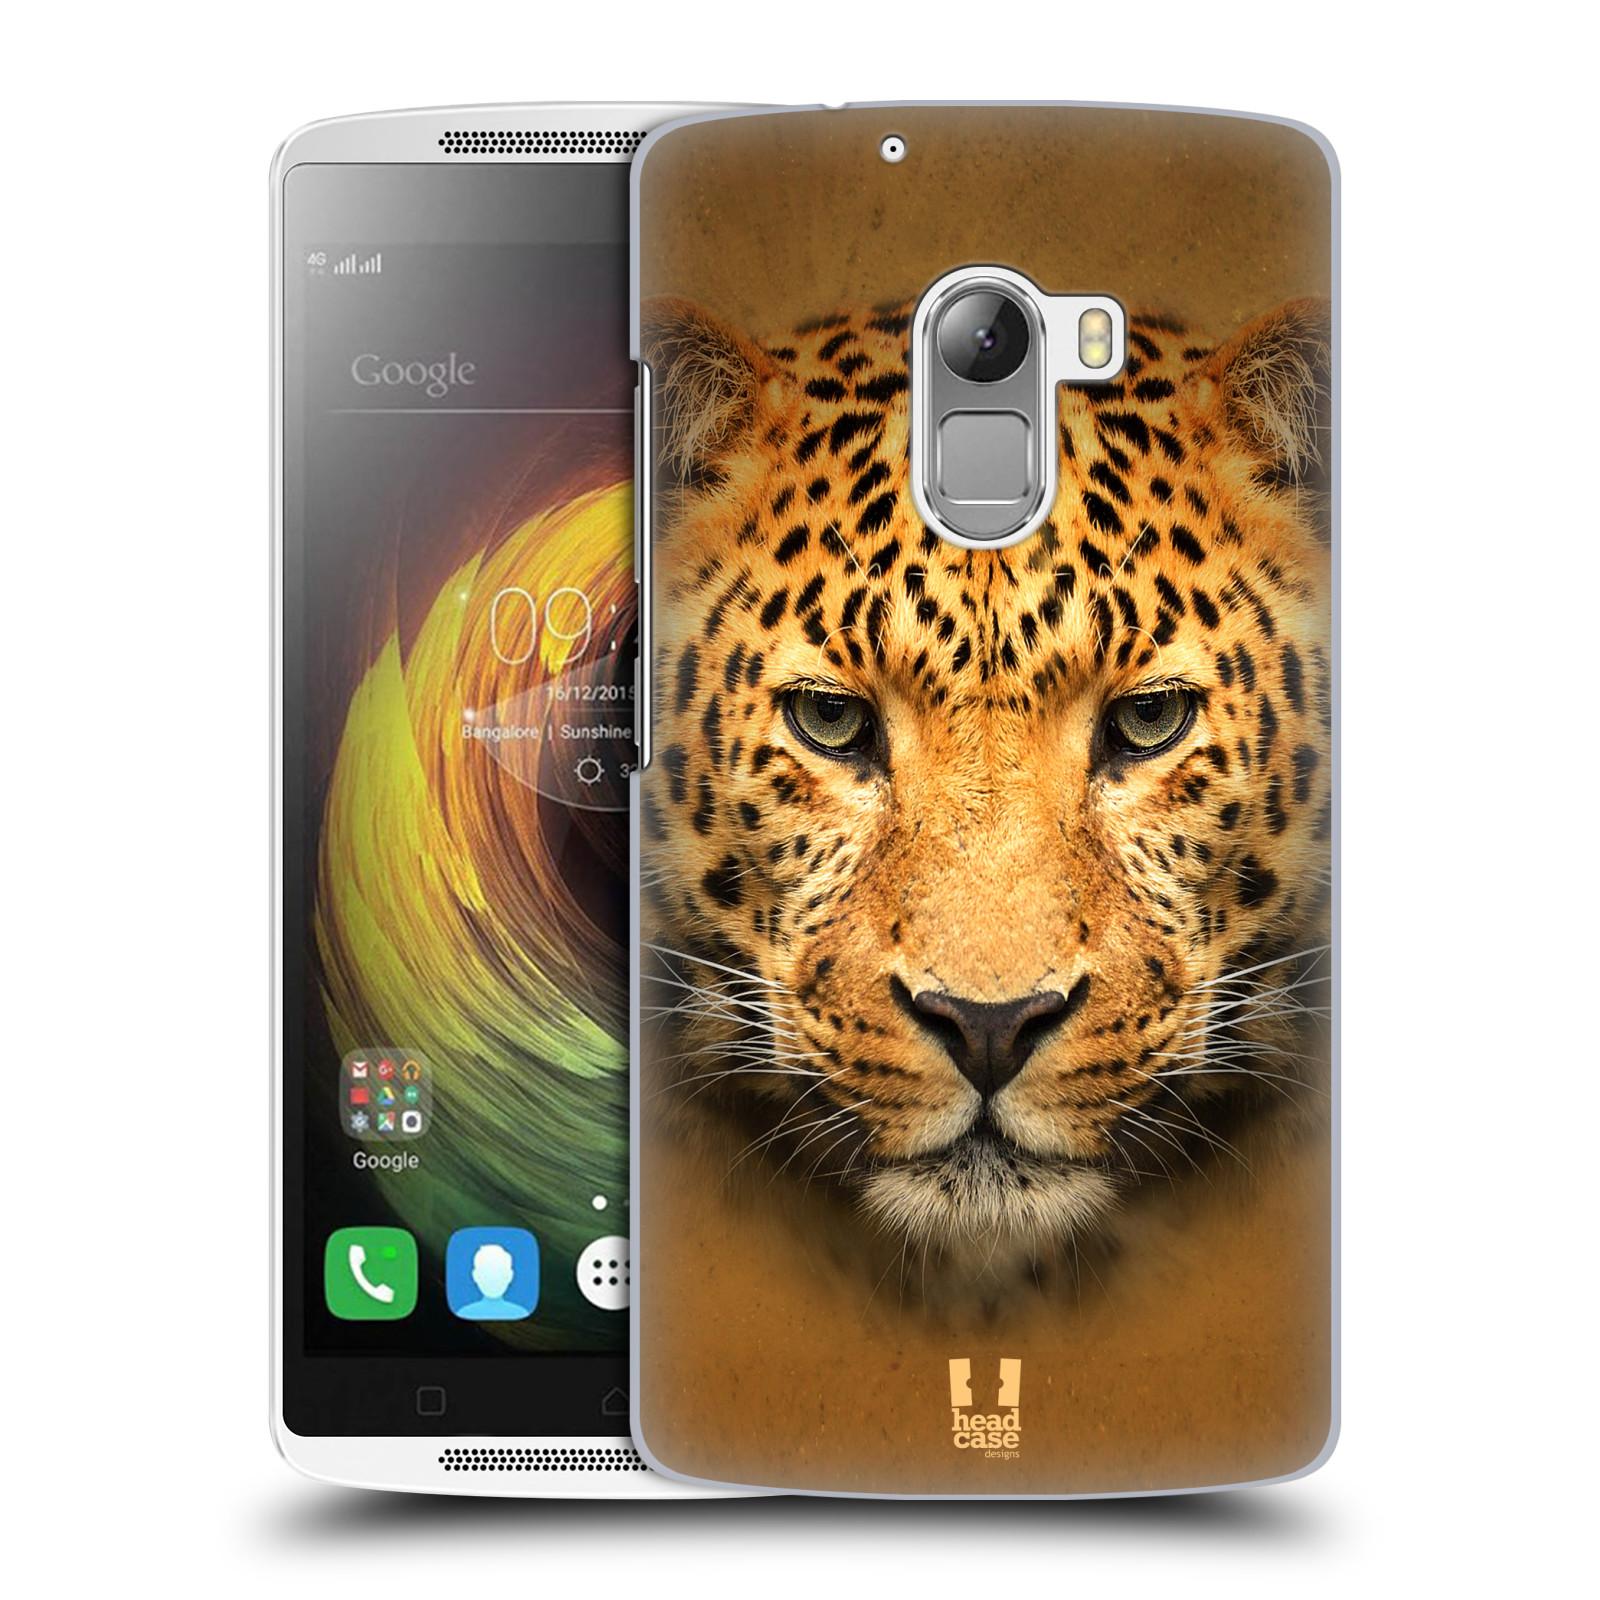 HEAD CASE pevný plastový obal na mobil LENOVO A7010 / A7010 DUAL / K4 Note / Vibe X3 lite vzor Zvířecí tváře 2 leopard